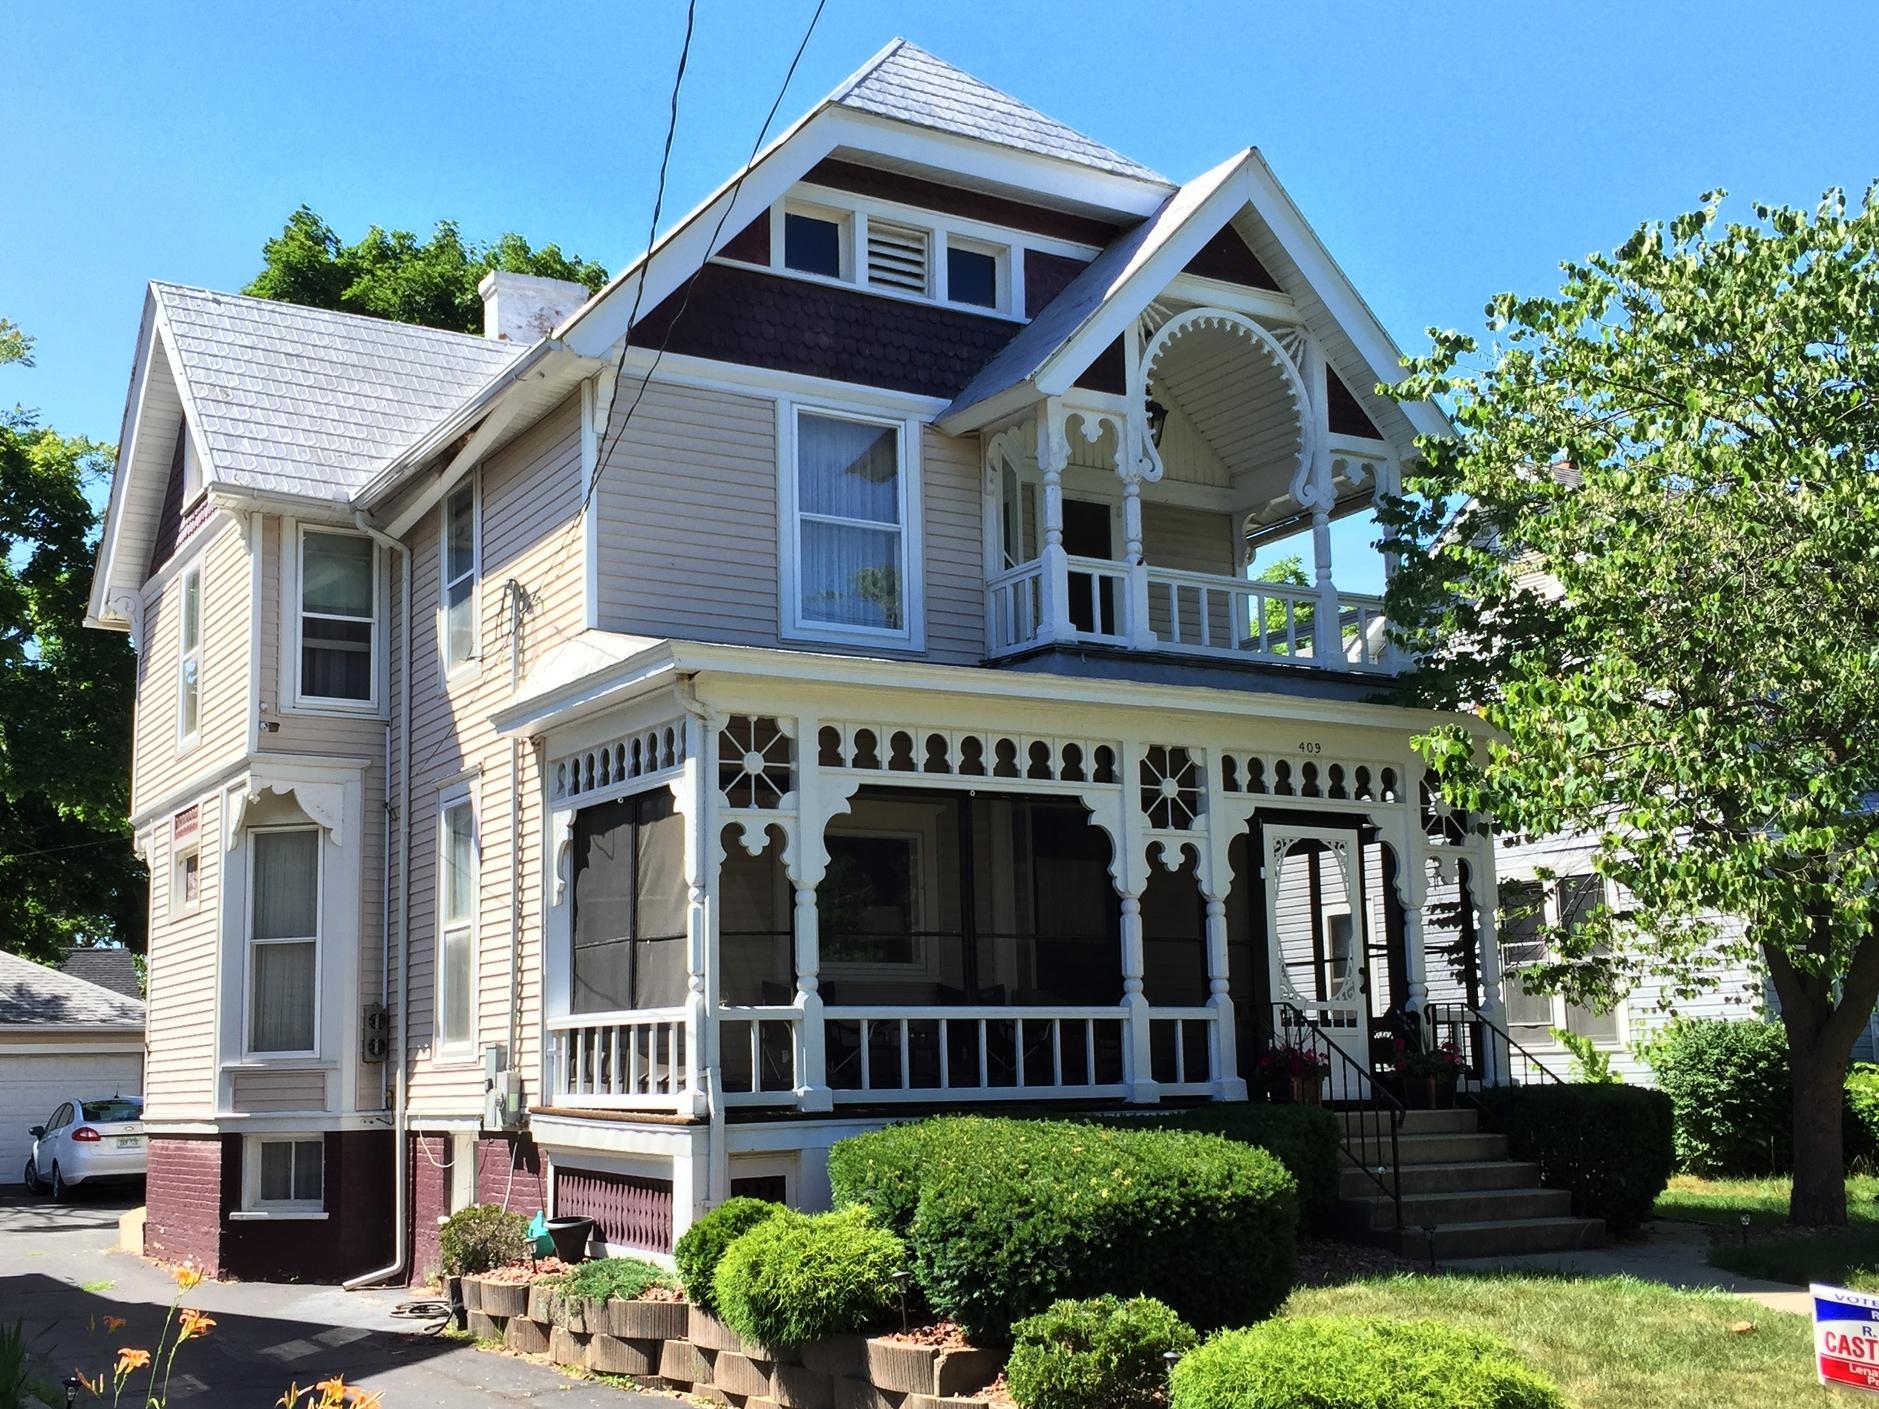 Herman Matthes House, 409 Finch Street, c. 1895